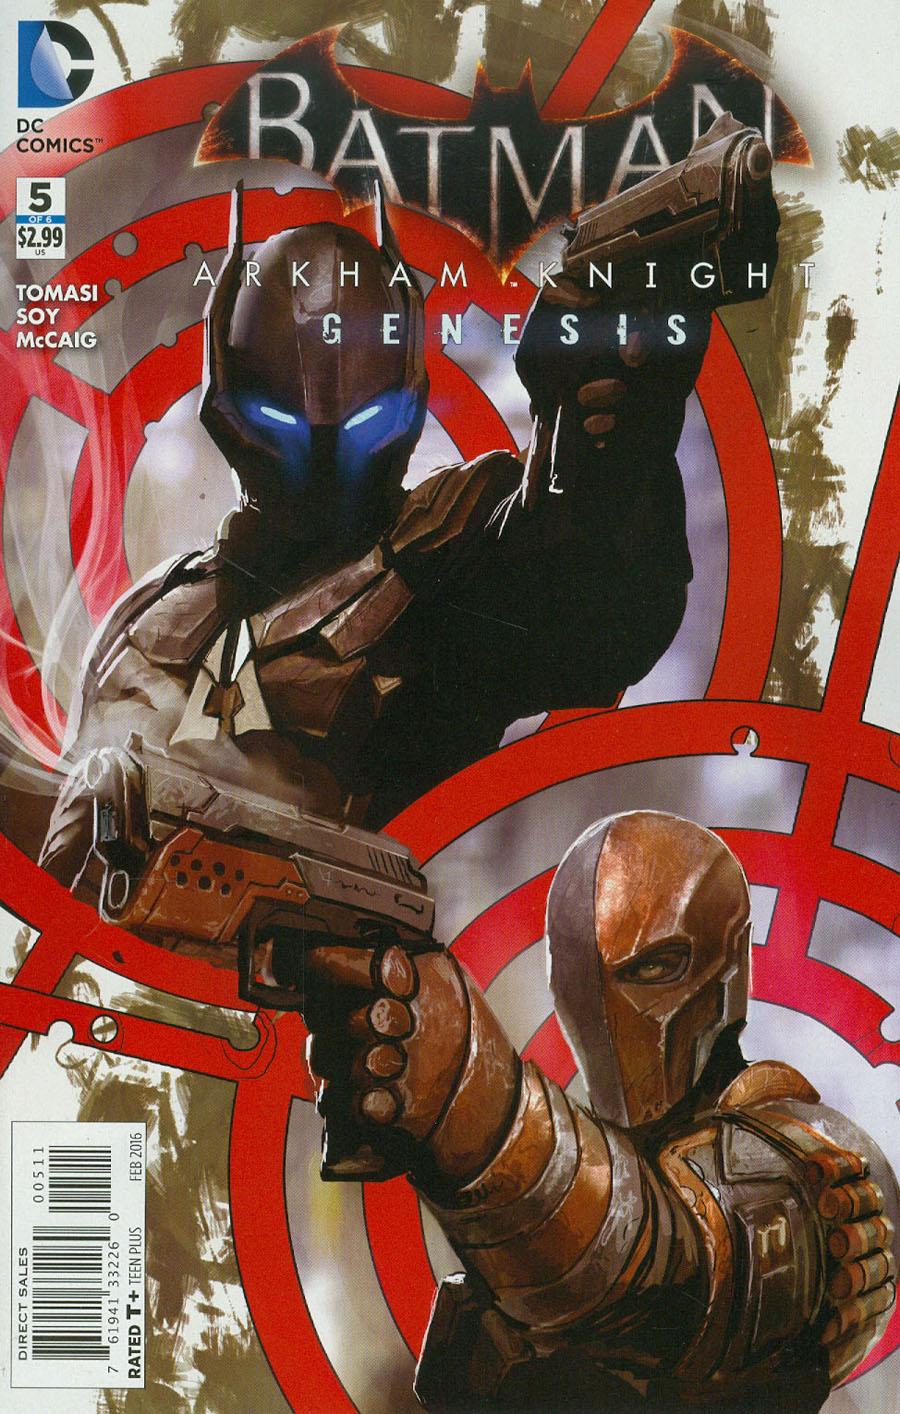 Batman Arkham Knight Genesis #5